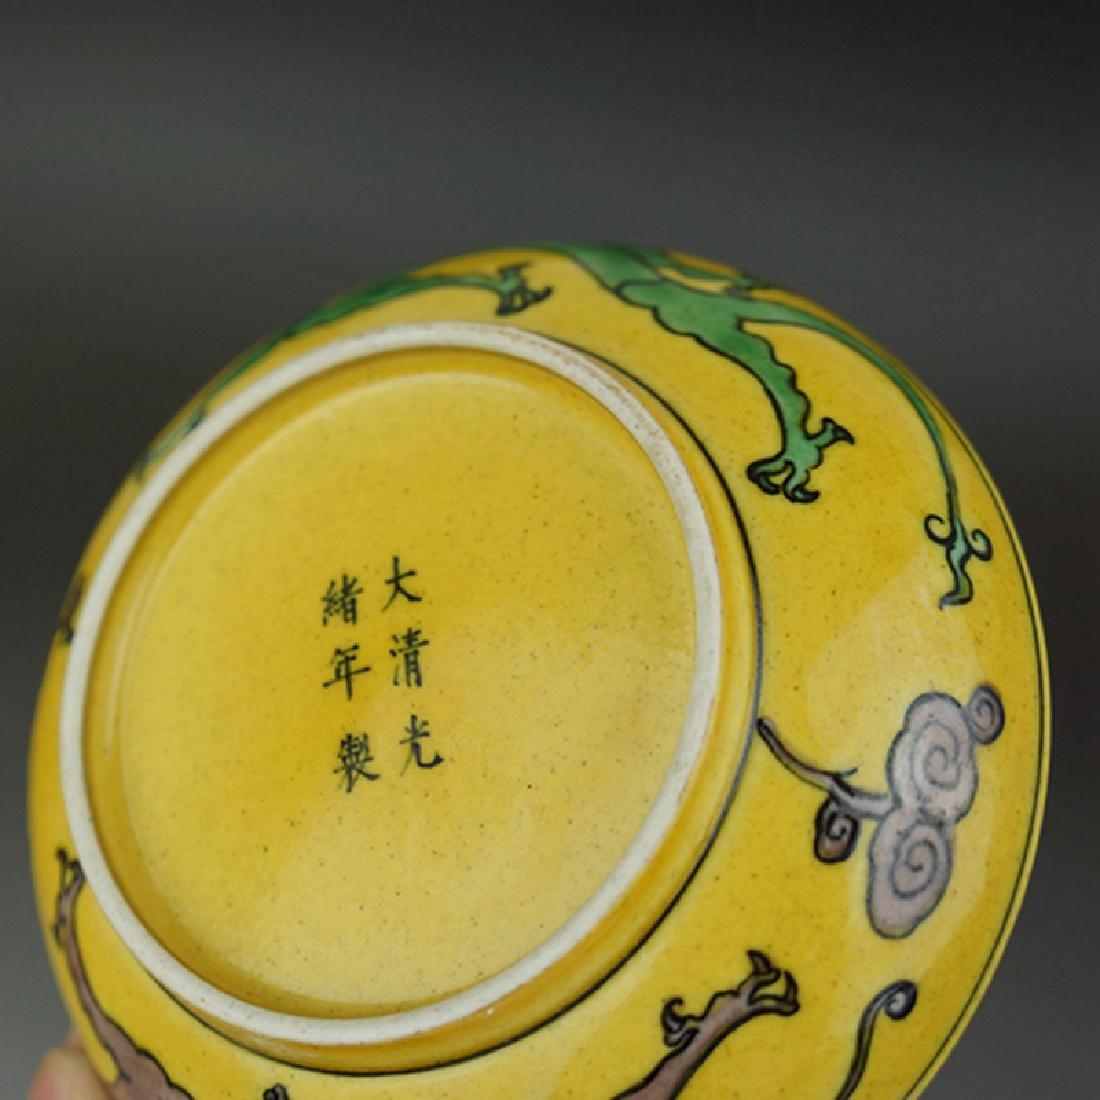 Pair Chinese Porcelain Plates Guangxu Mark - 4